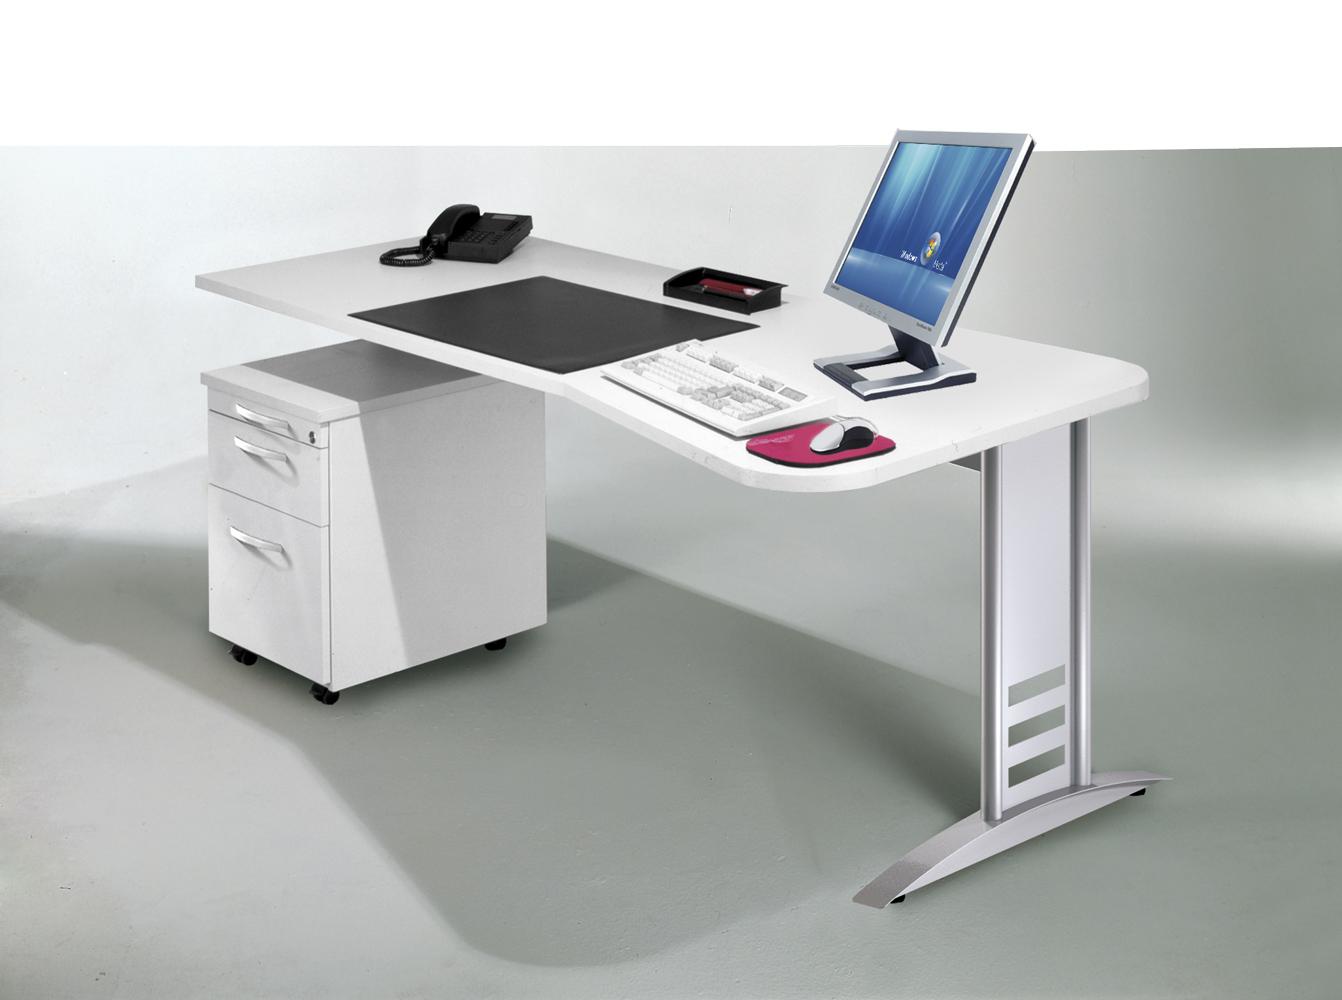 tec-art | Kerkmann Office Design – Büromöbel aus Bielefeld